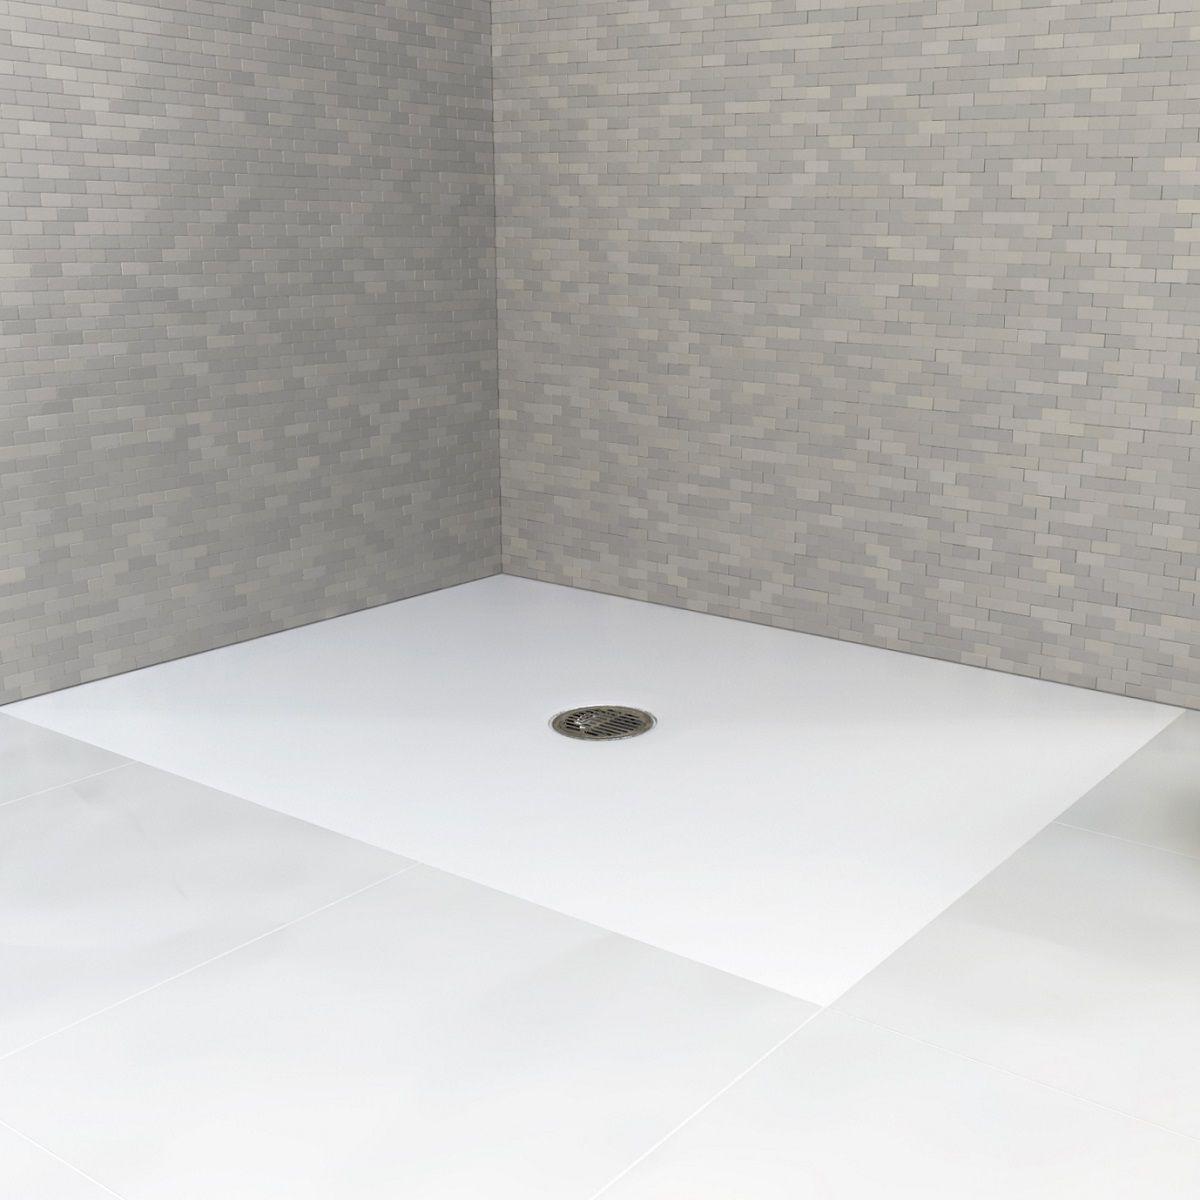 Matki Continental 30 Slimline Floor Shower Tray